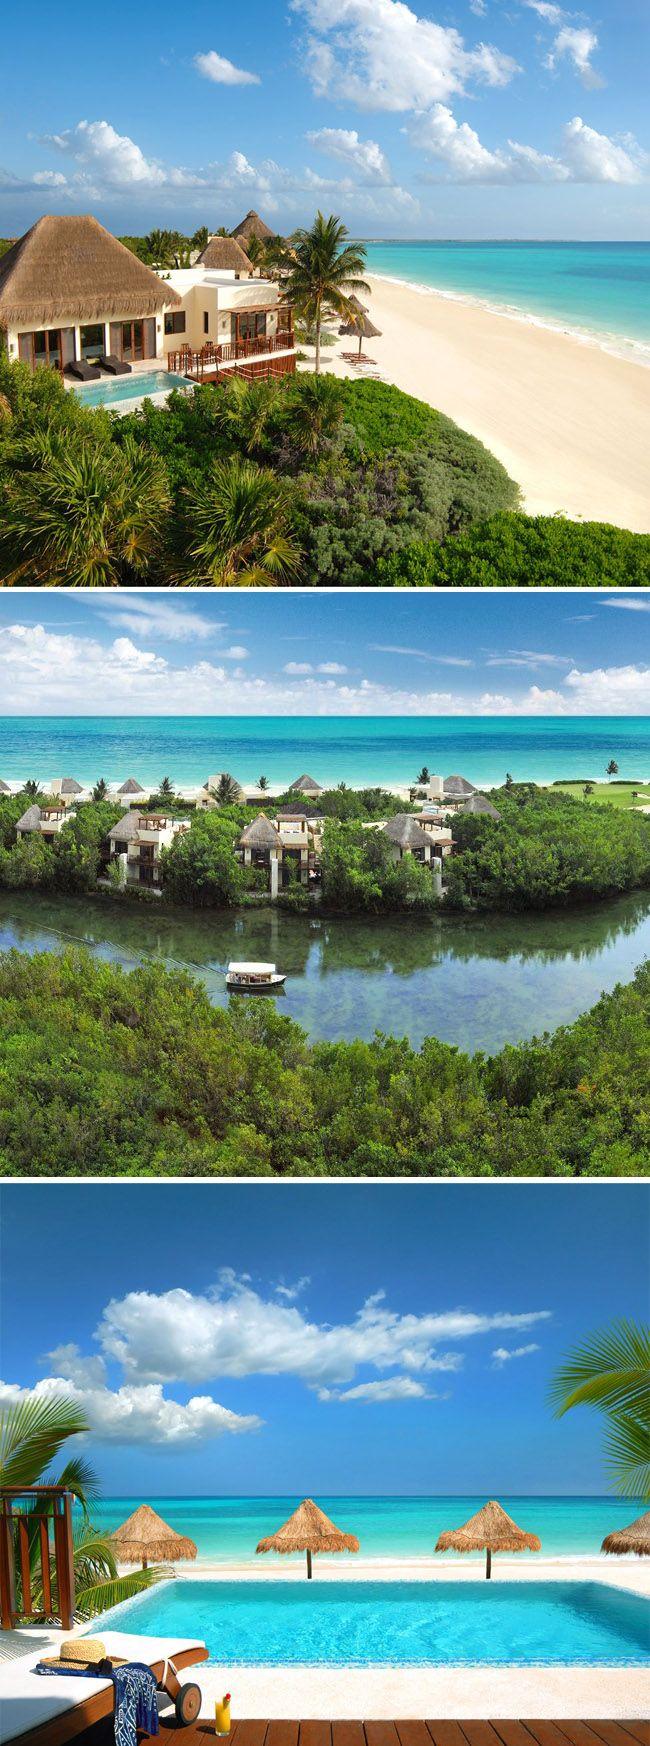 The Fairmont Mayakoba Resort in Playa del Carmen, Mexico. So beautiful and relaxing!